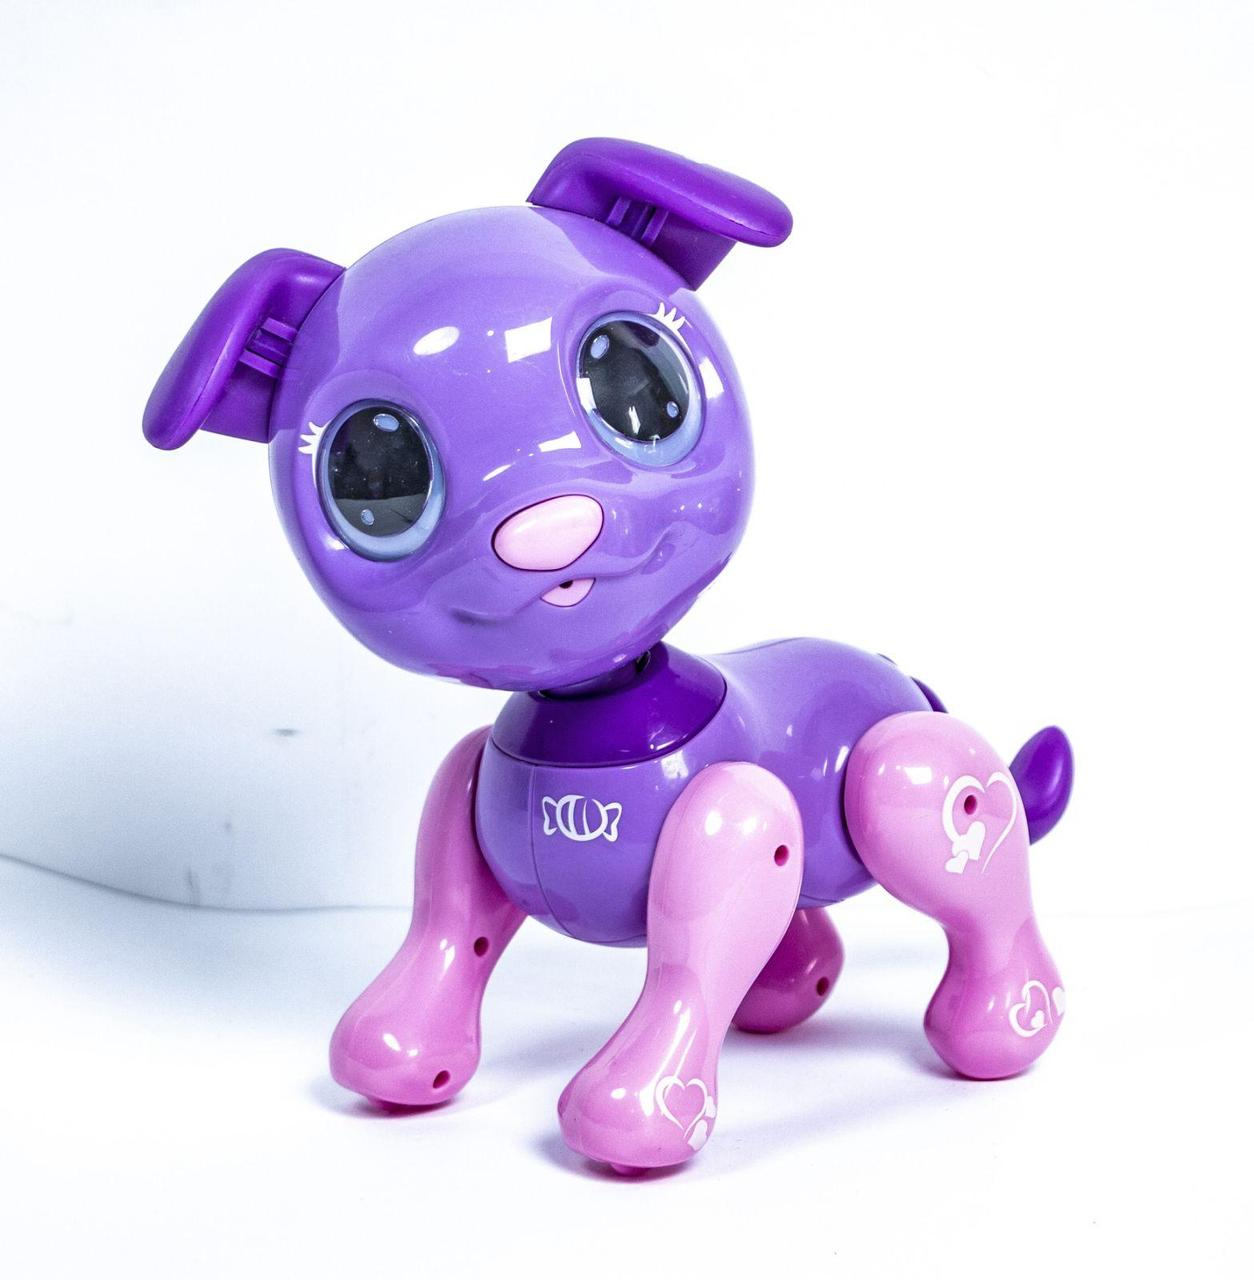 Интерактивная собака - CUTE FRIENDS SMART PUPPY JELLYBEAN 8312 оптом